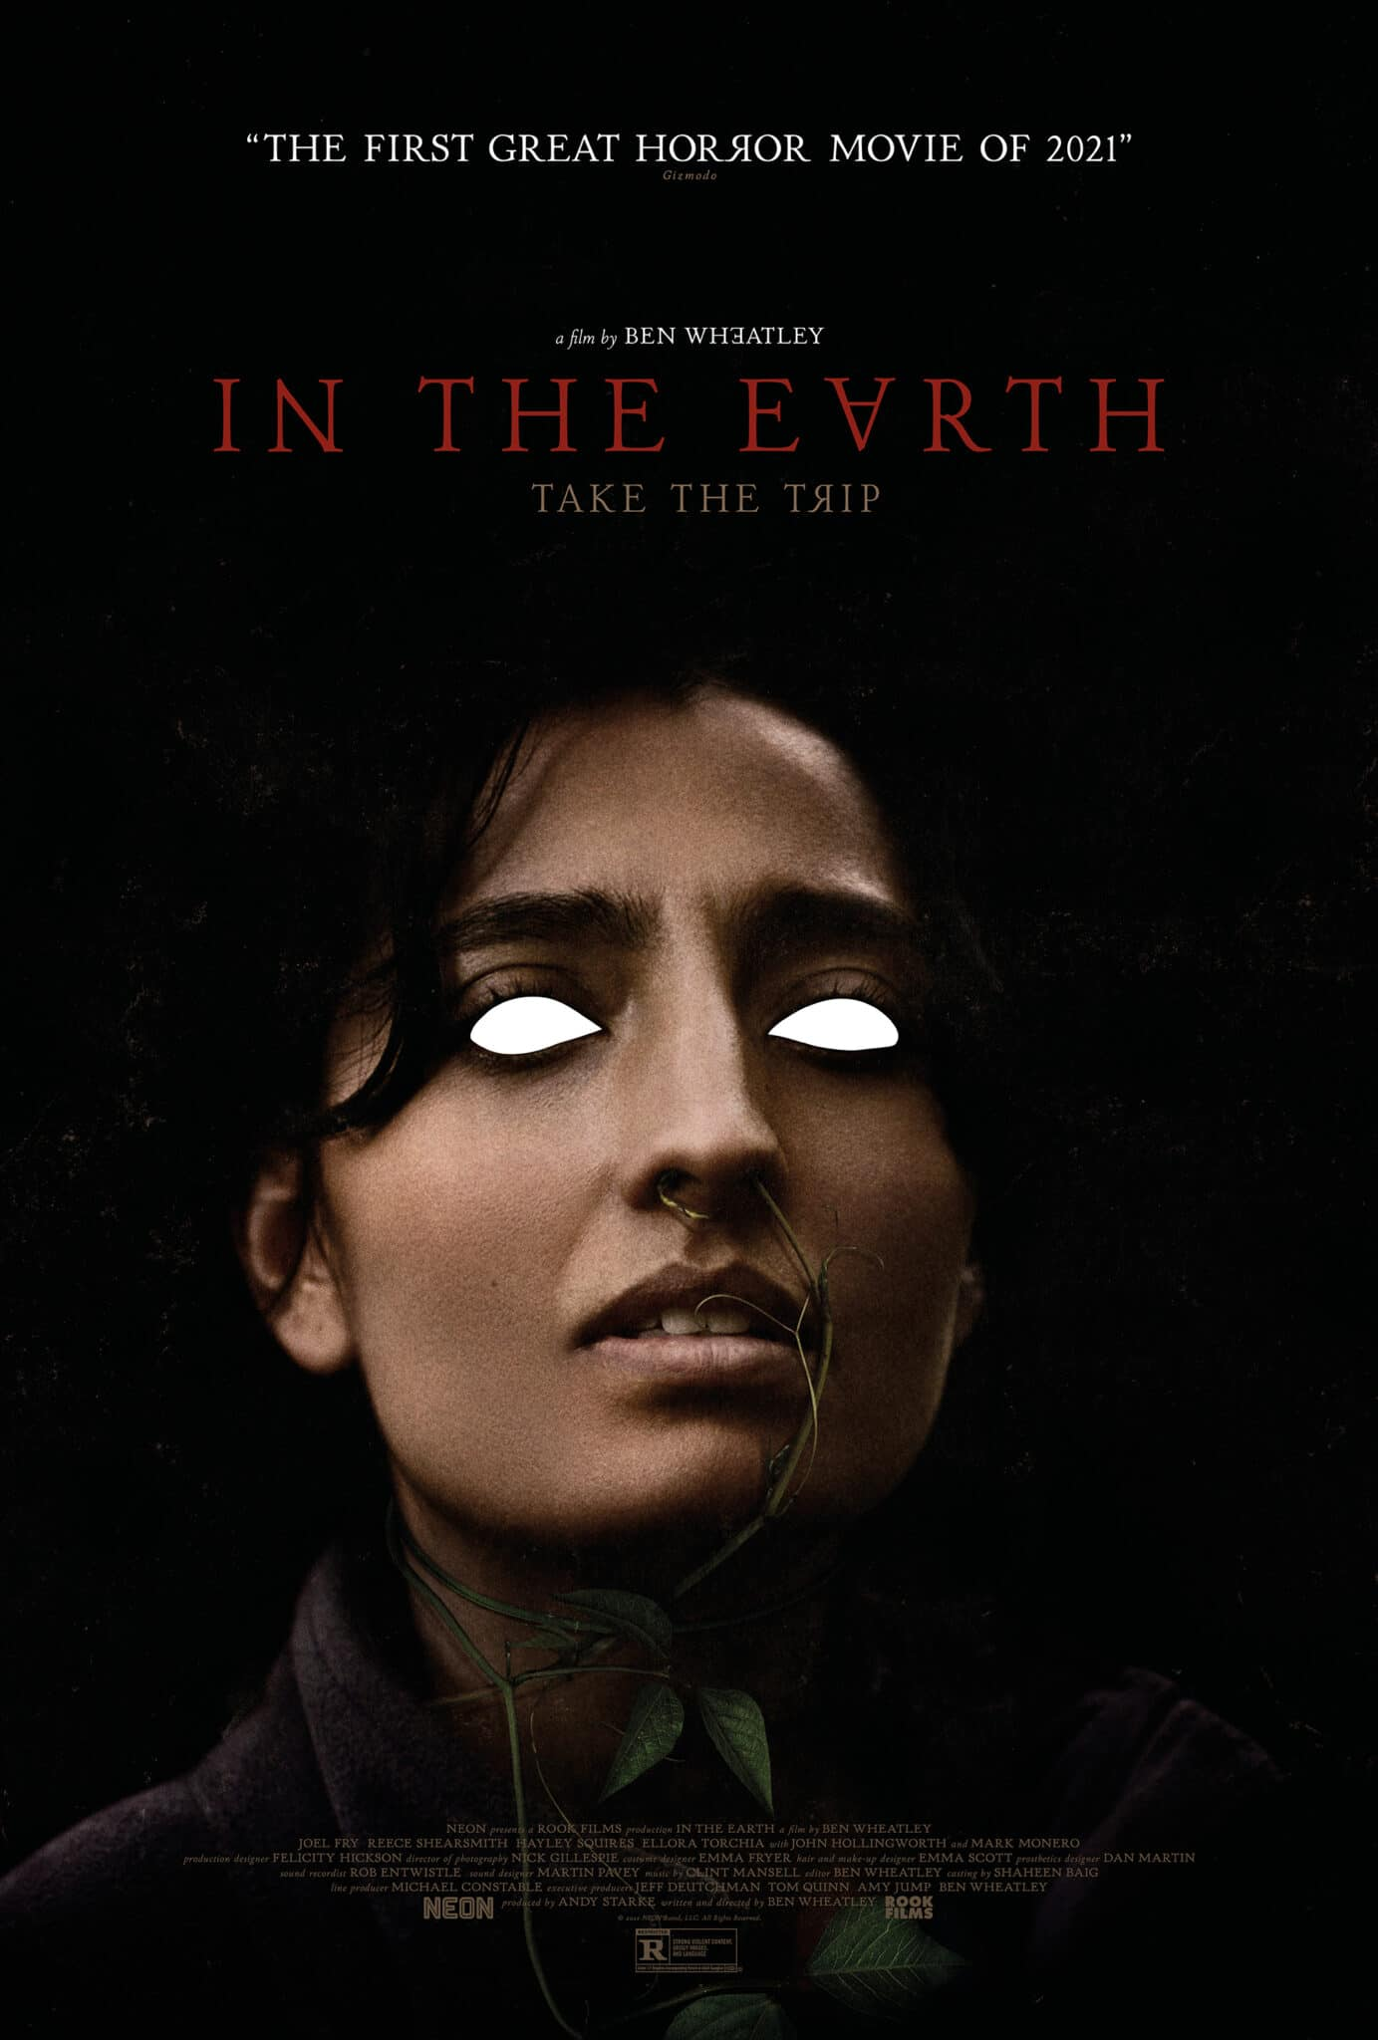 in-the-earth-Ellora-Torchia-poster-2021-ben-wheatley